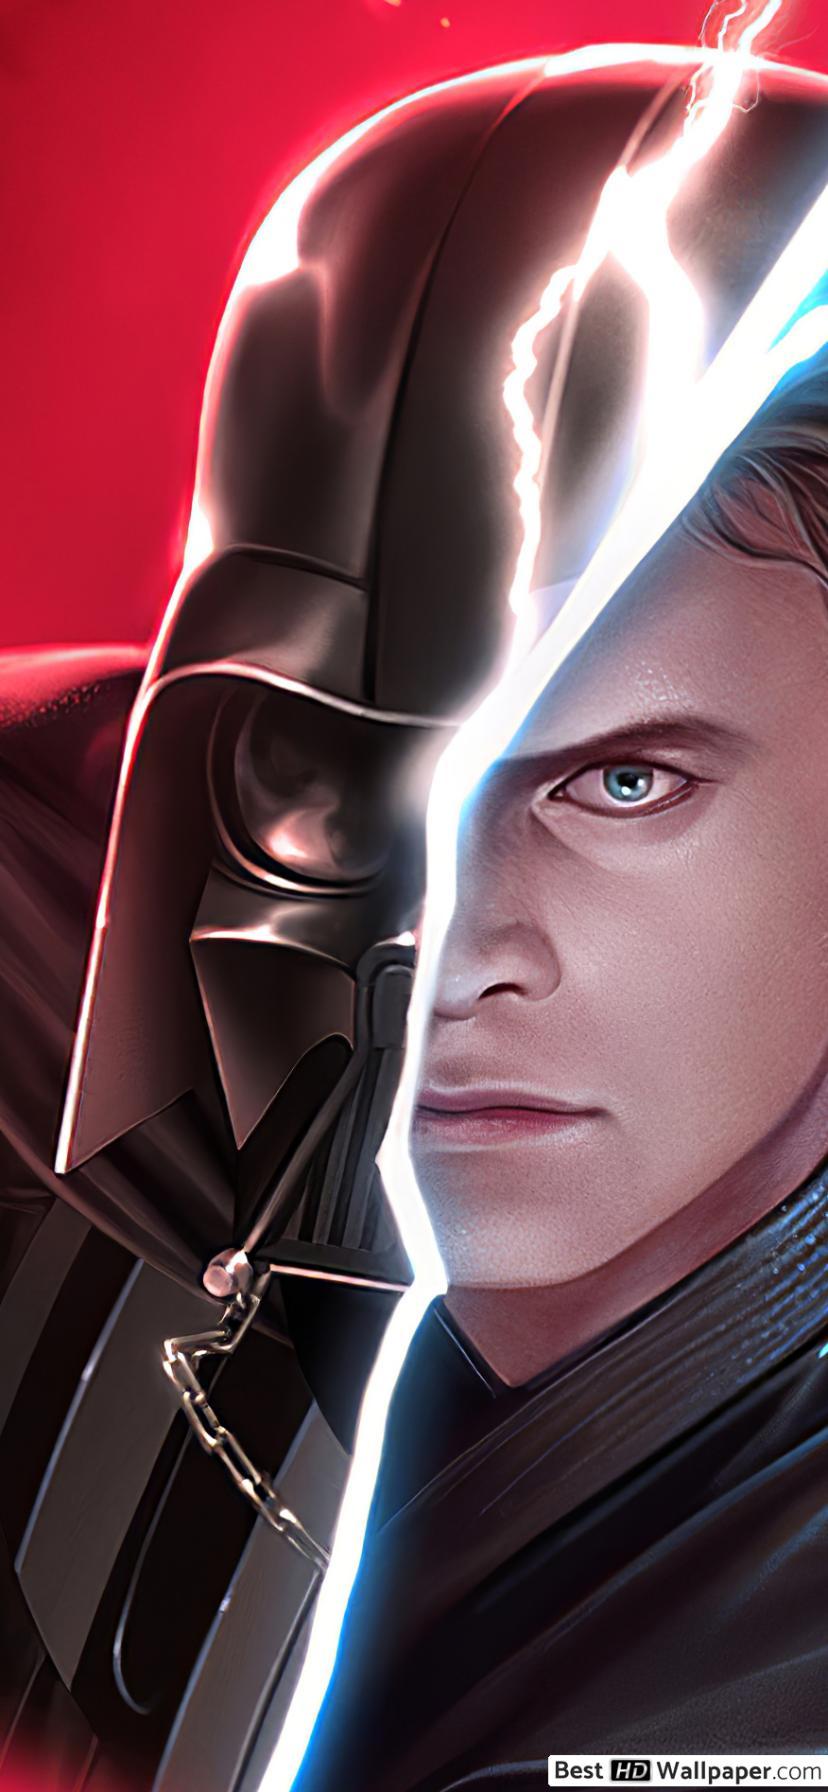 Anakin Skywalker Wallpaper Hd 3037178 Hd Wallpaper Backgrounds Download